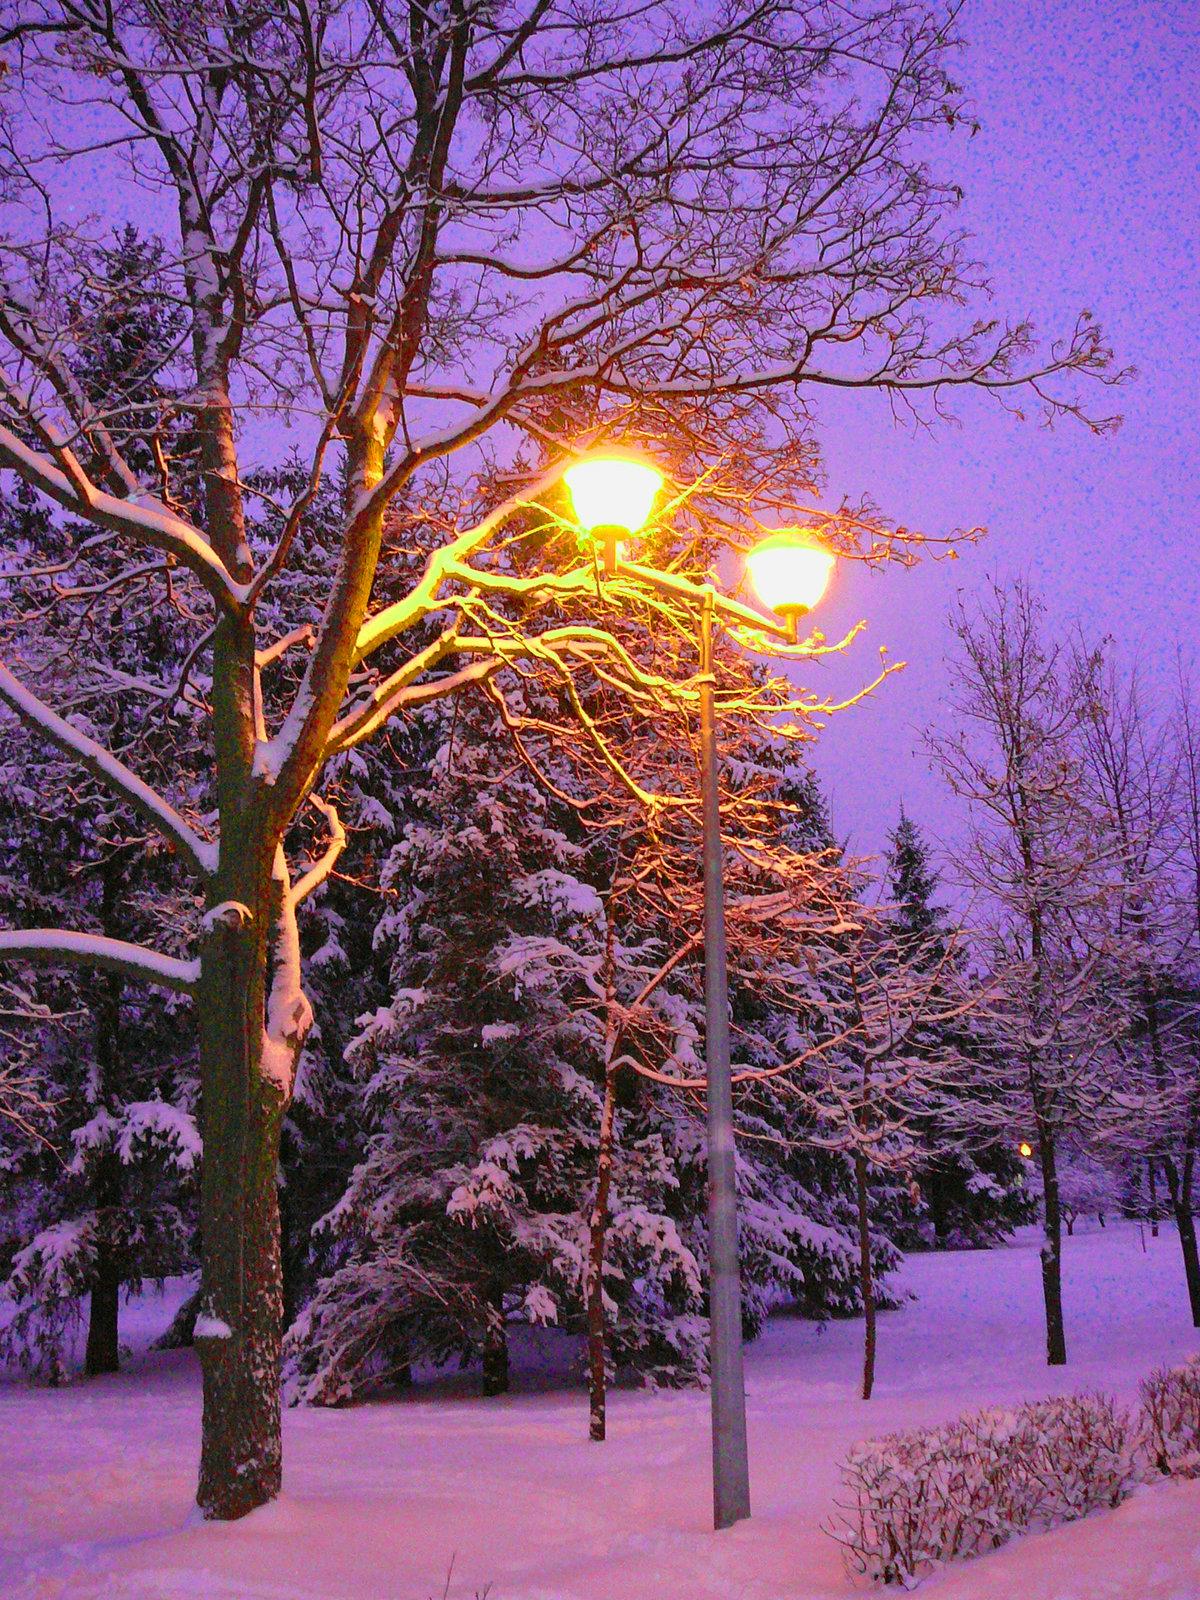 позволял картинка зимний вечер на телефон поставлен